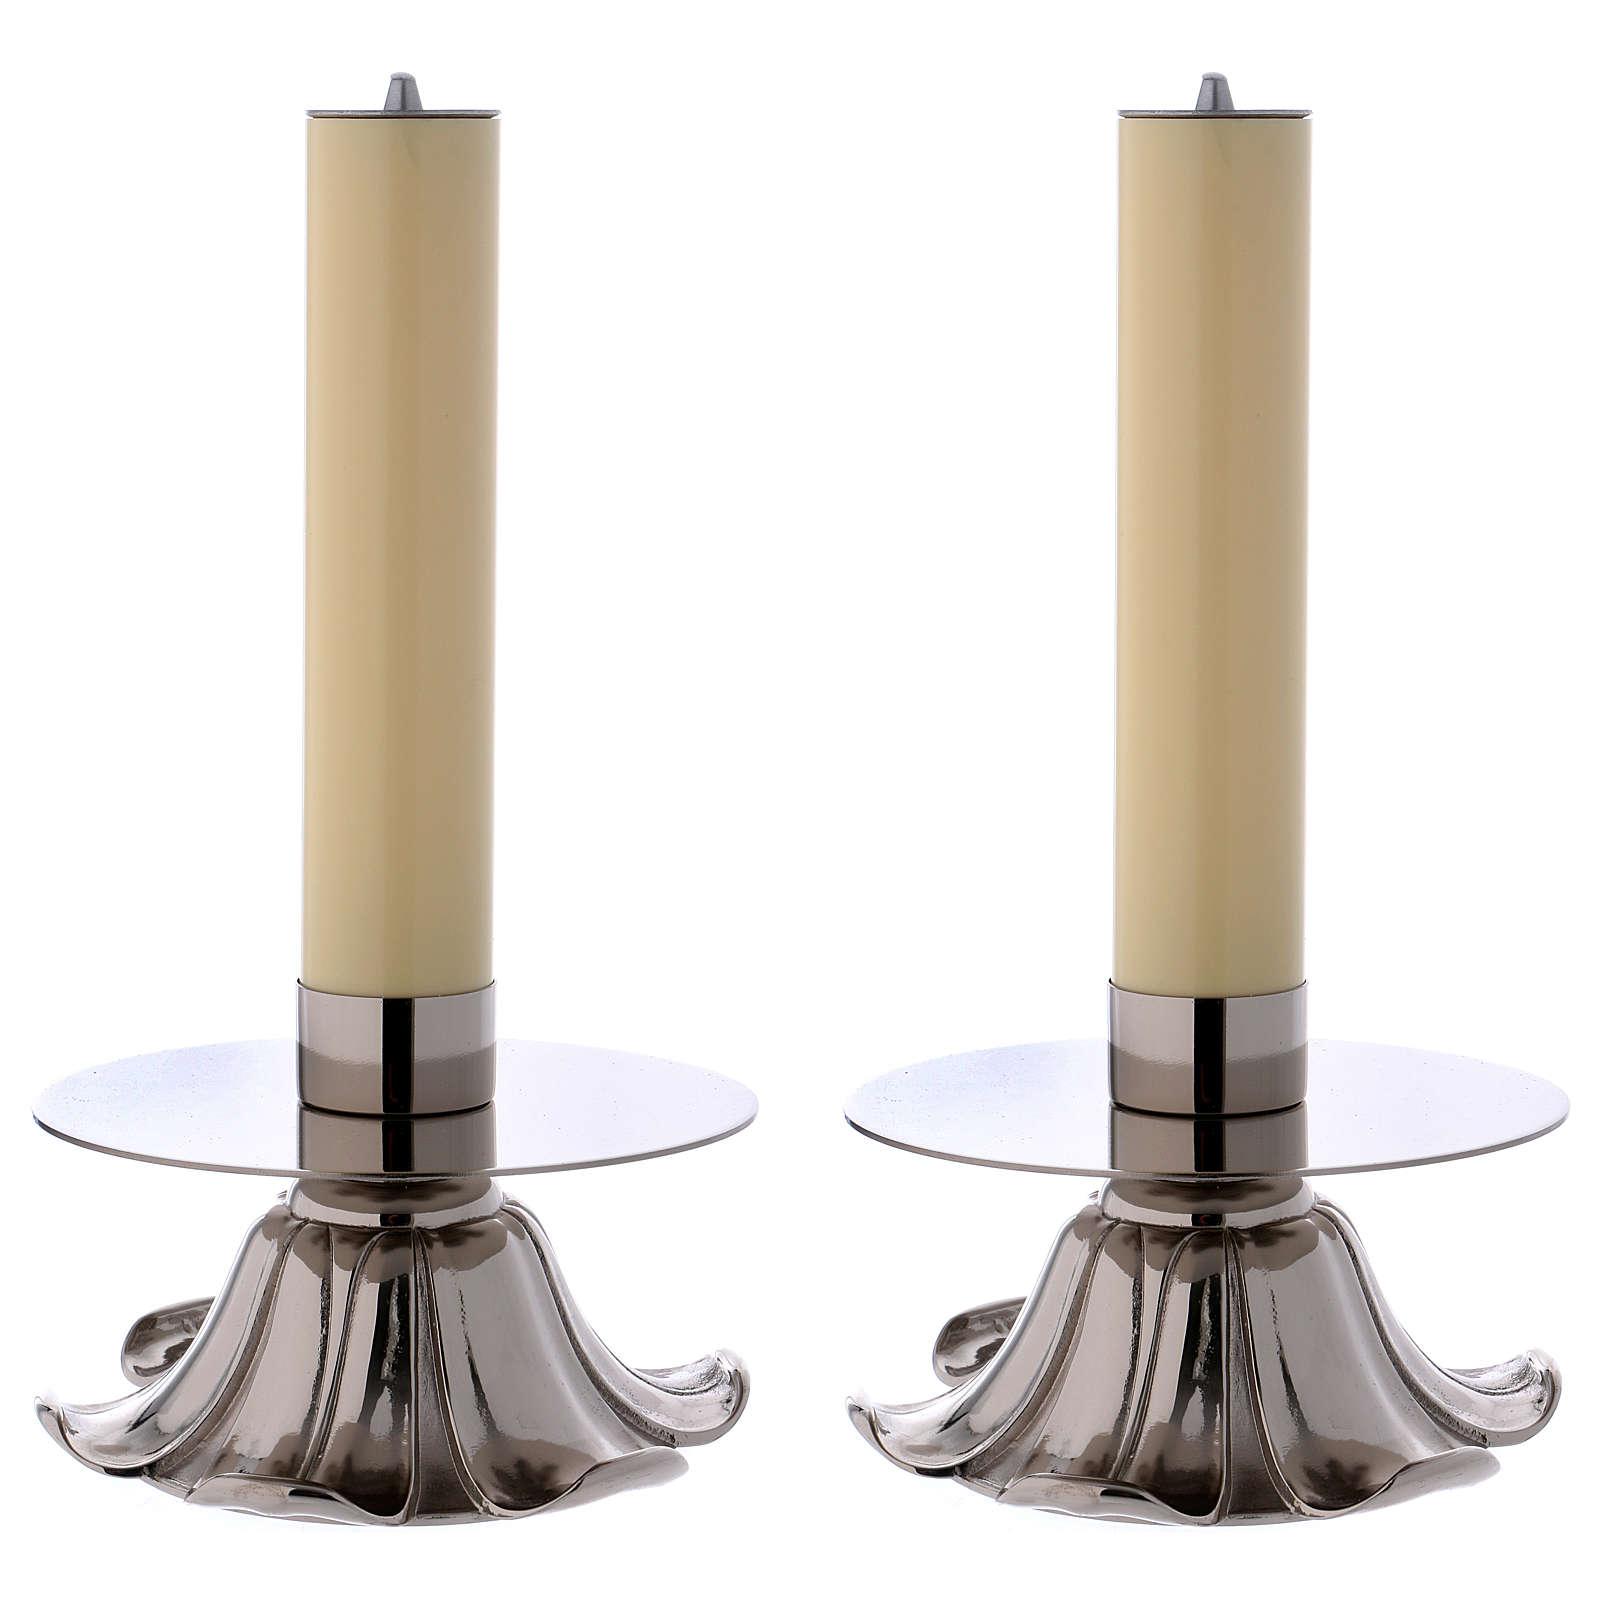 Candelieri in ottone argentato petali 4